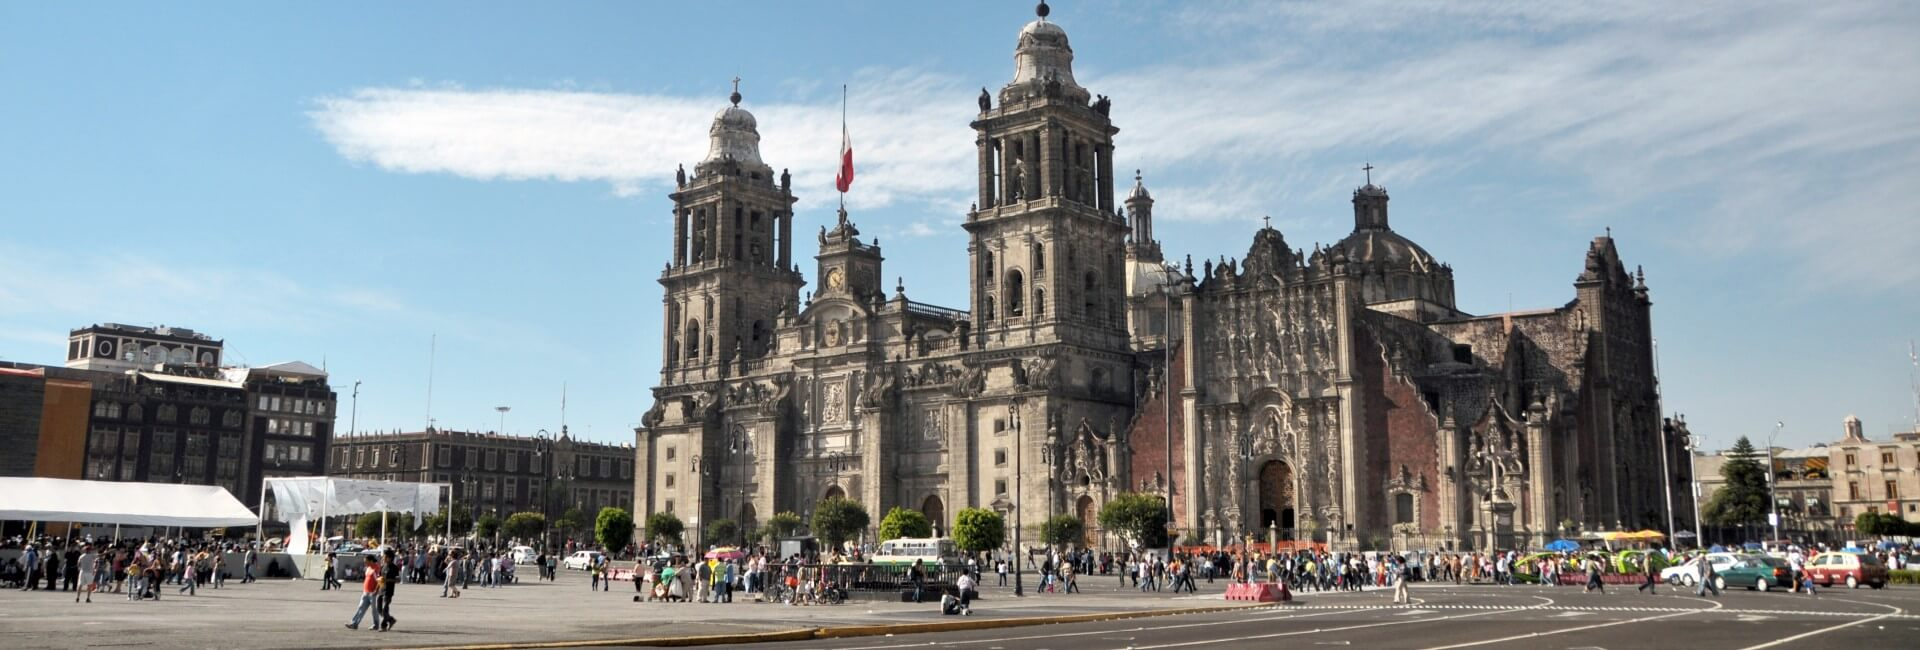 magic of mexico city